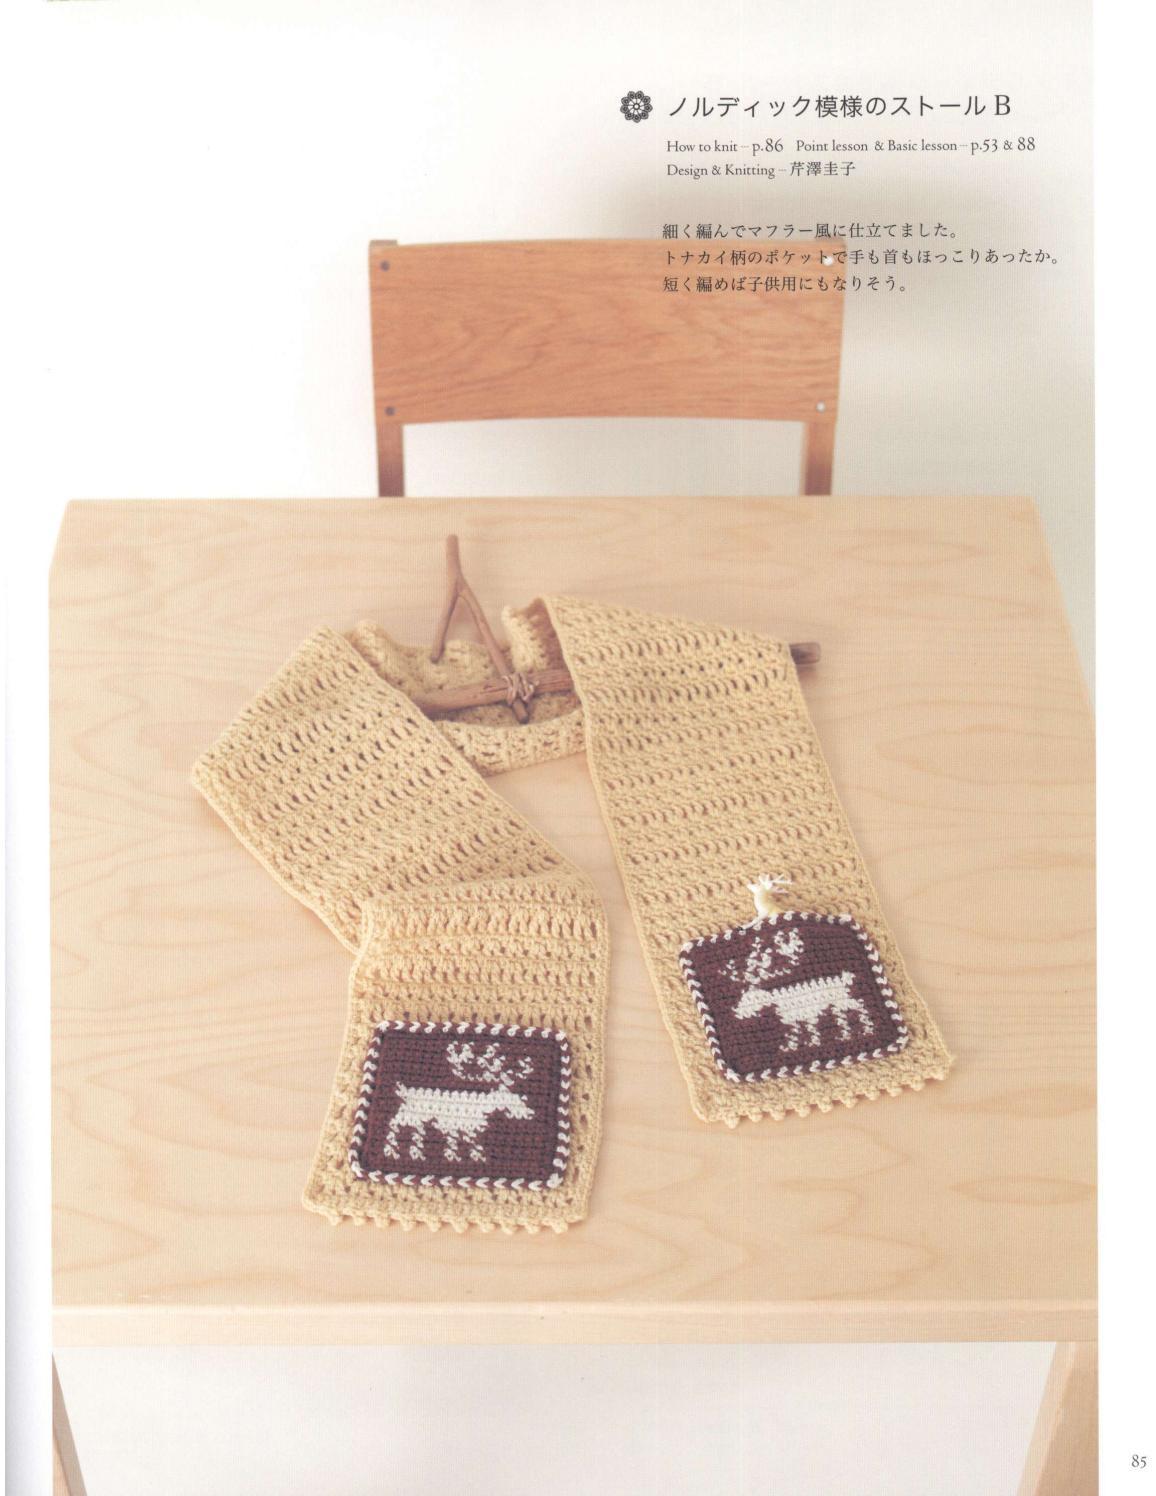 Asahi original crochet best selection 2012 page 85